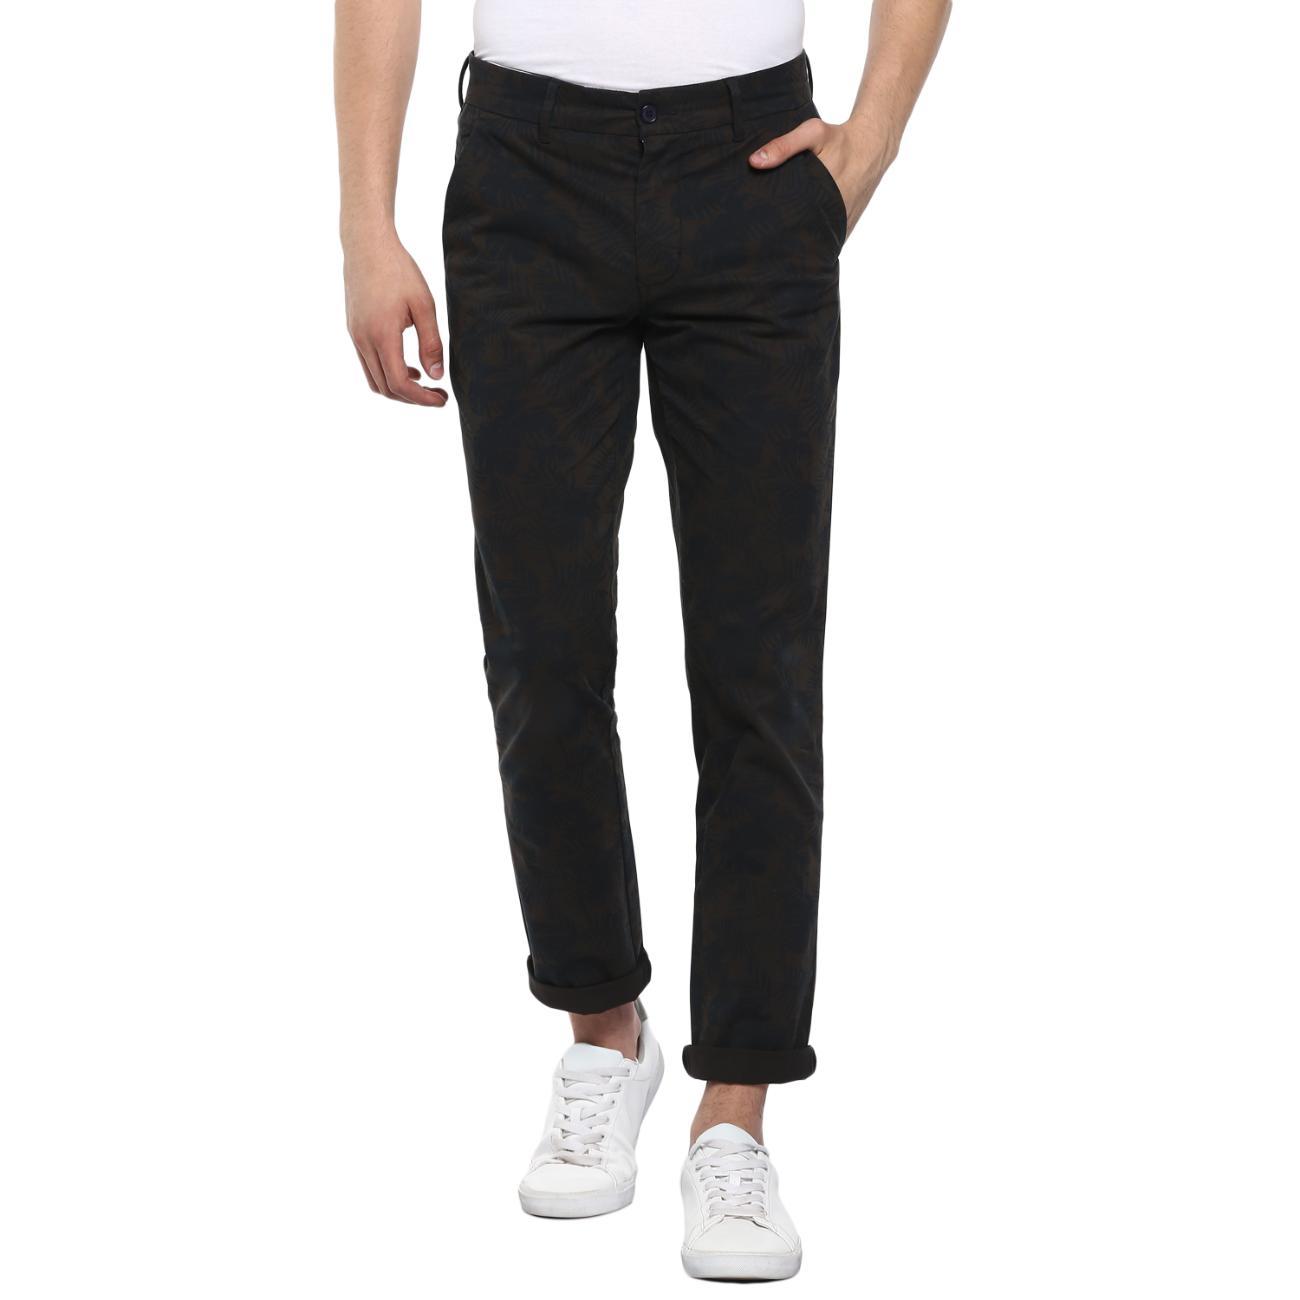 Buy Olive/Black Trouser Online